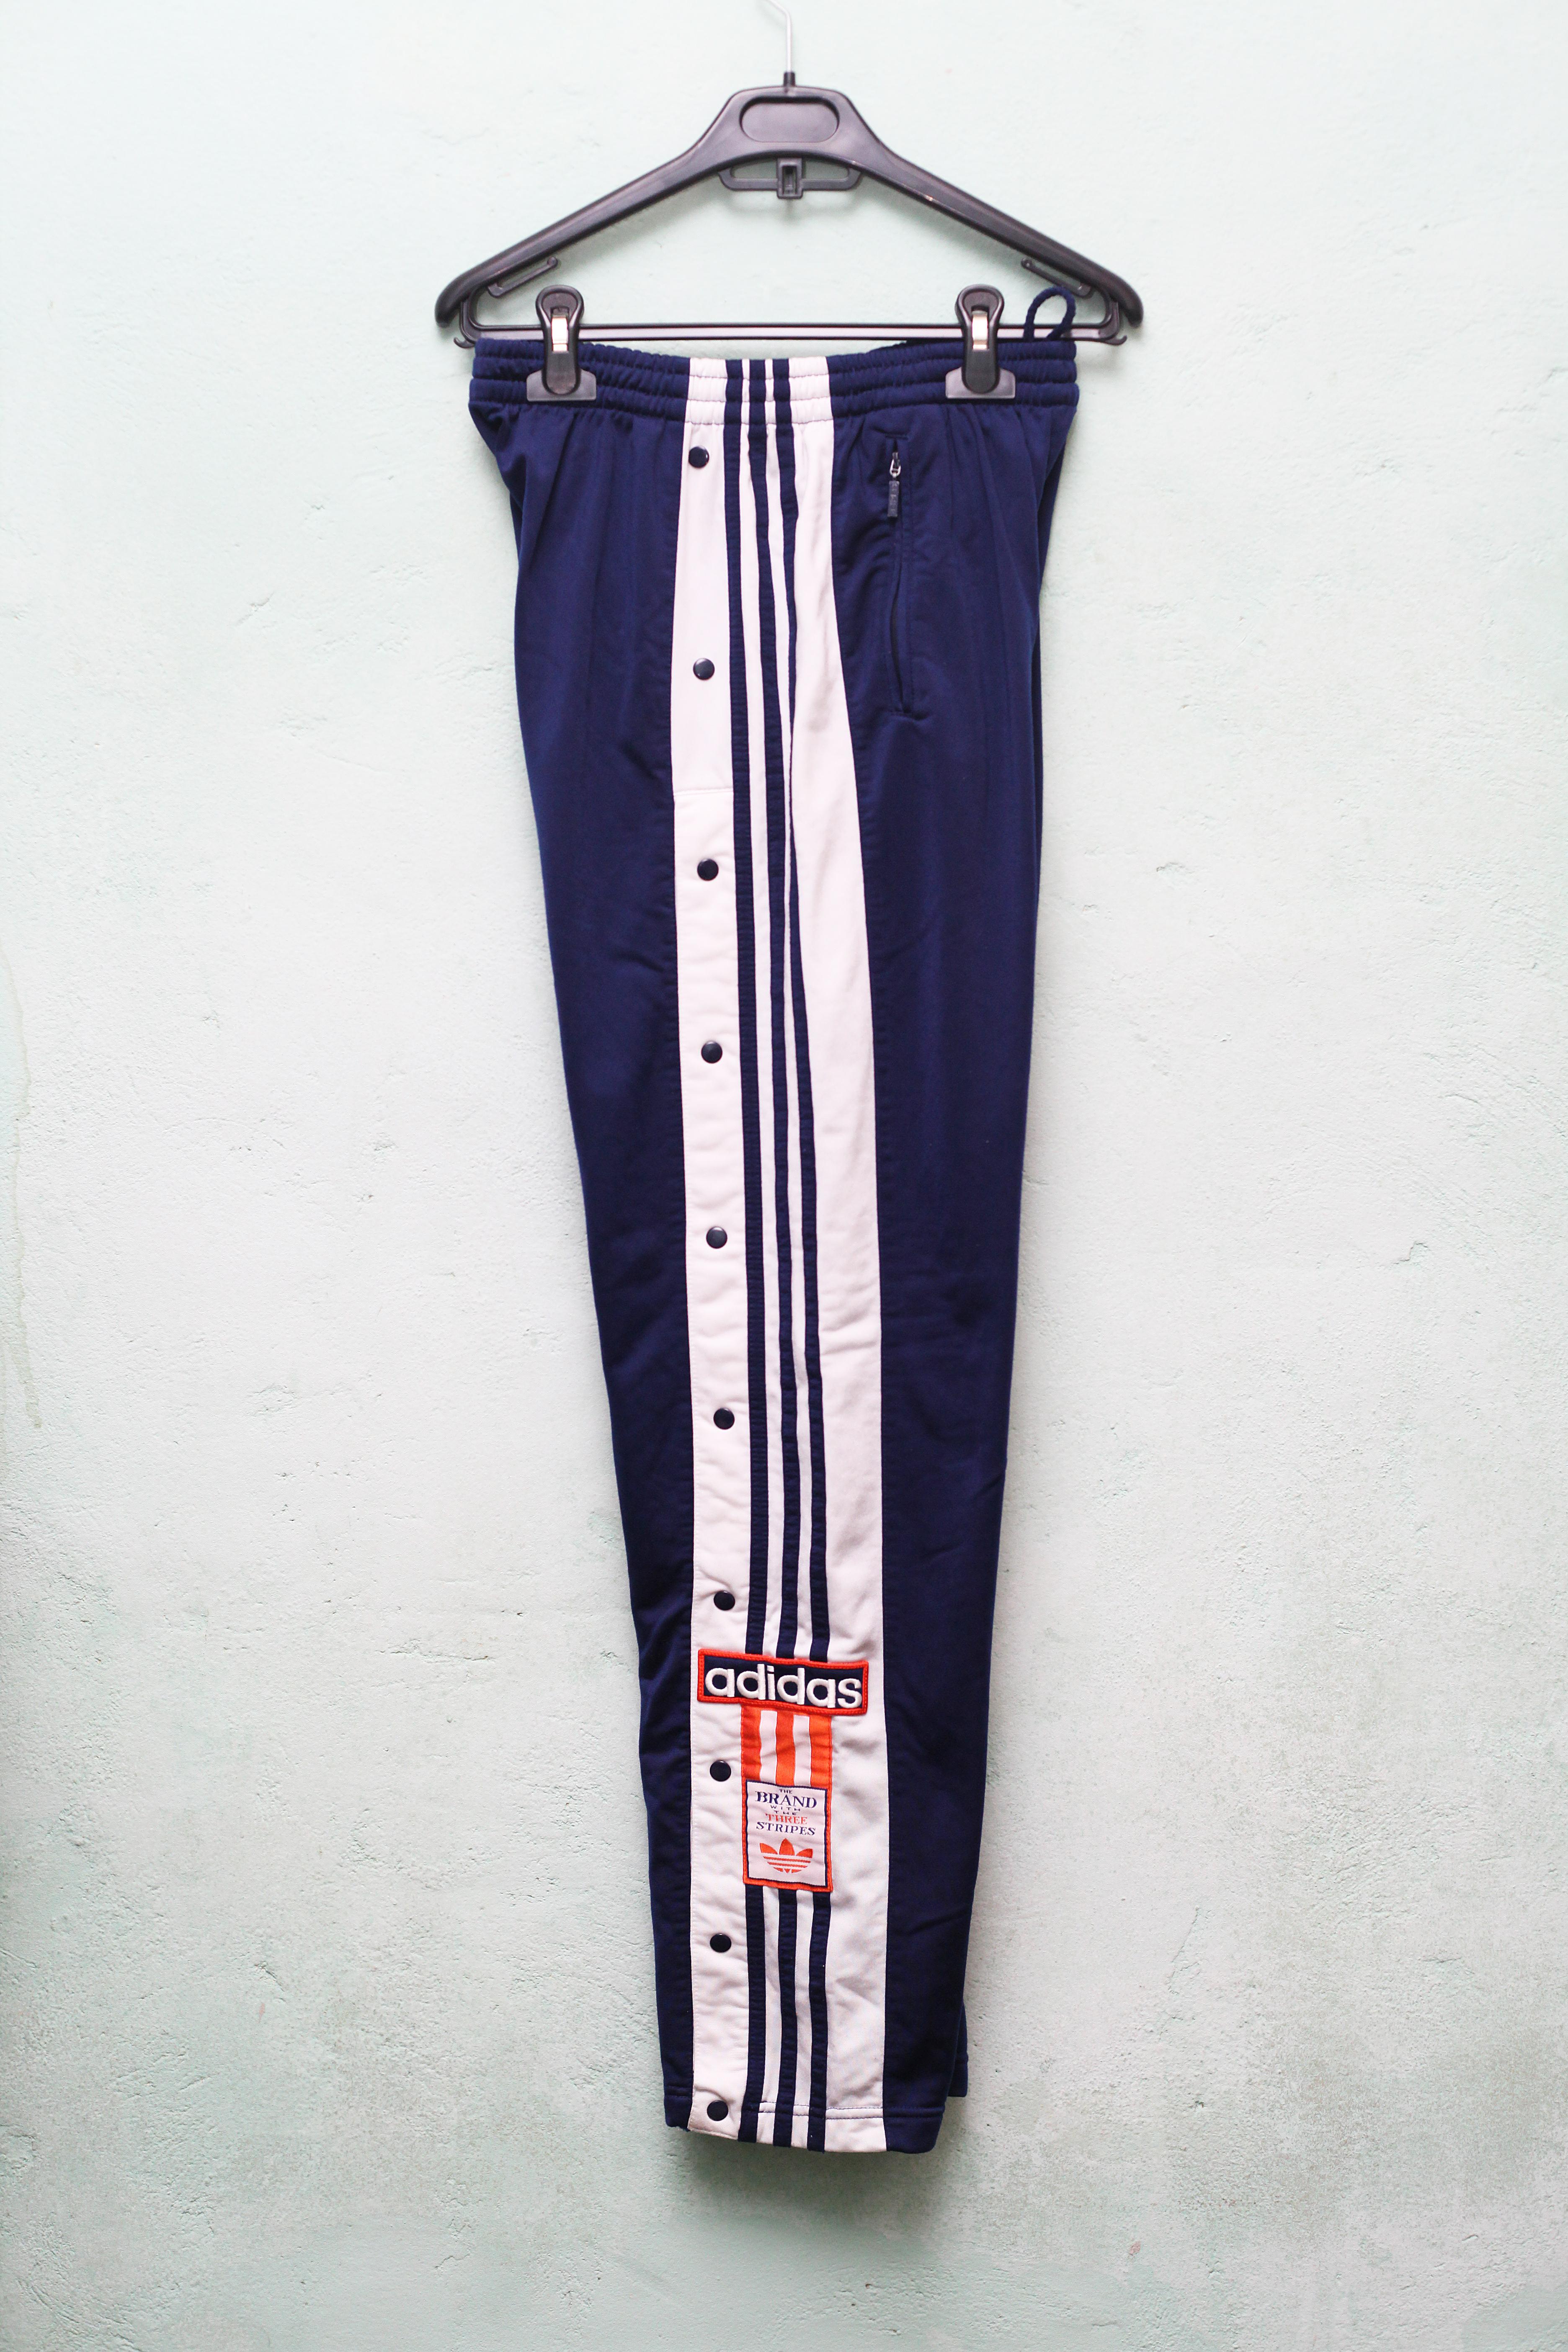 adidas track pants 90s